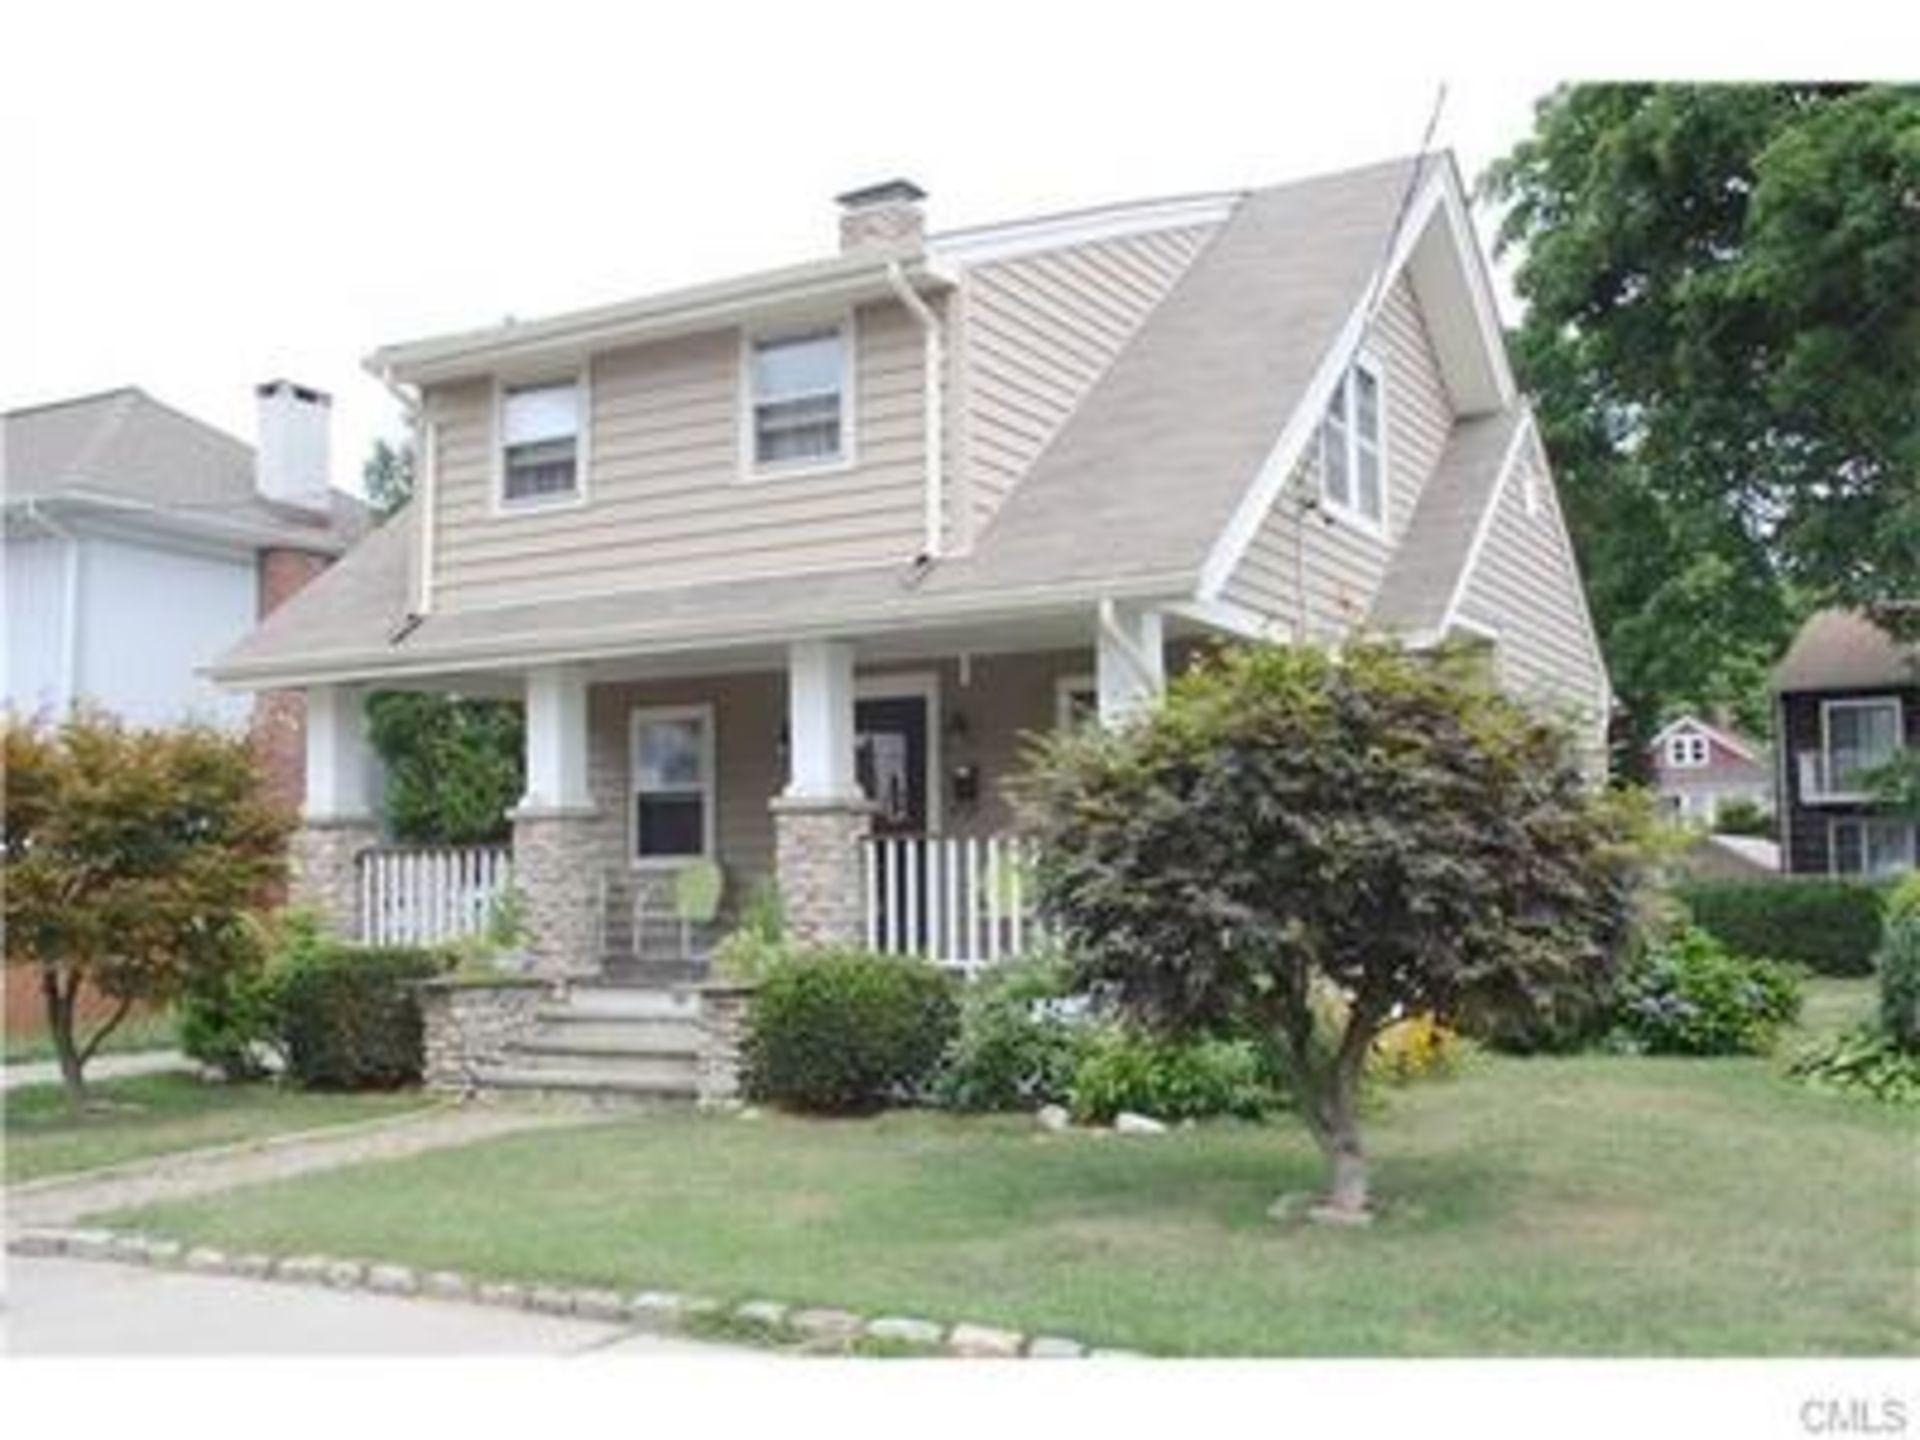 Glenville Homes For Sale